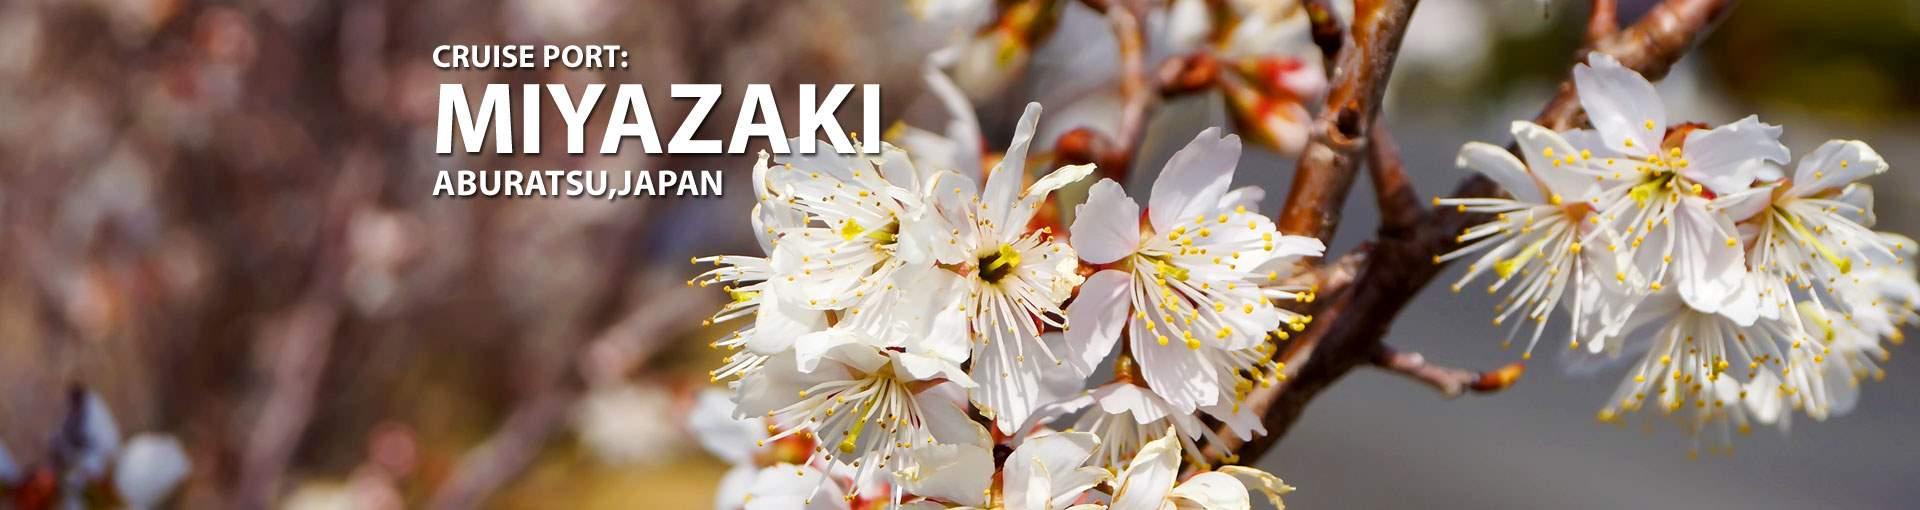 Cruises to Miyazaki (Aburatsu) - Japan